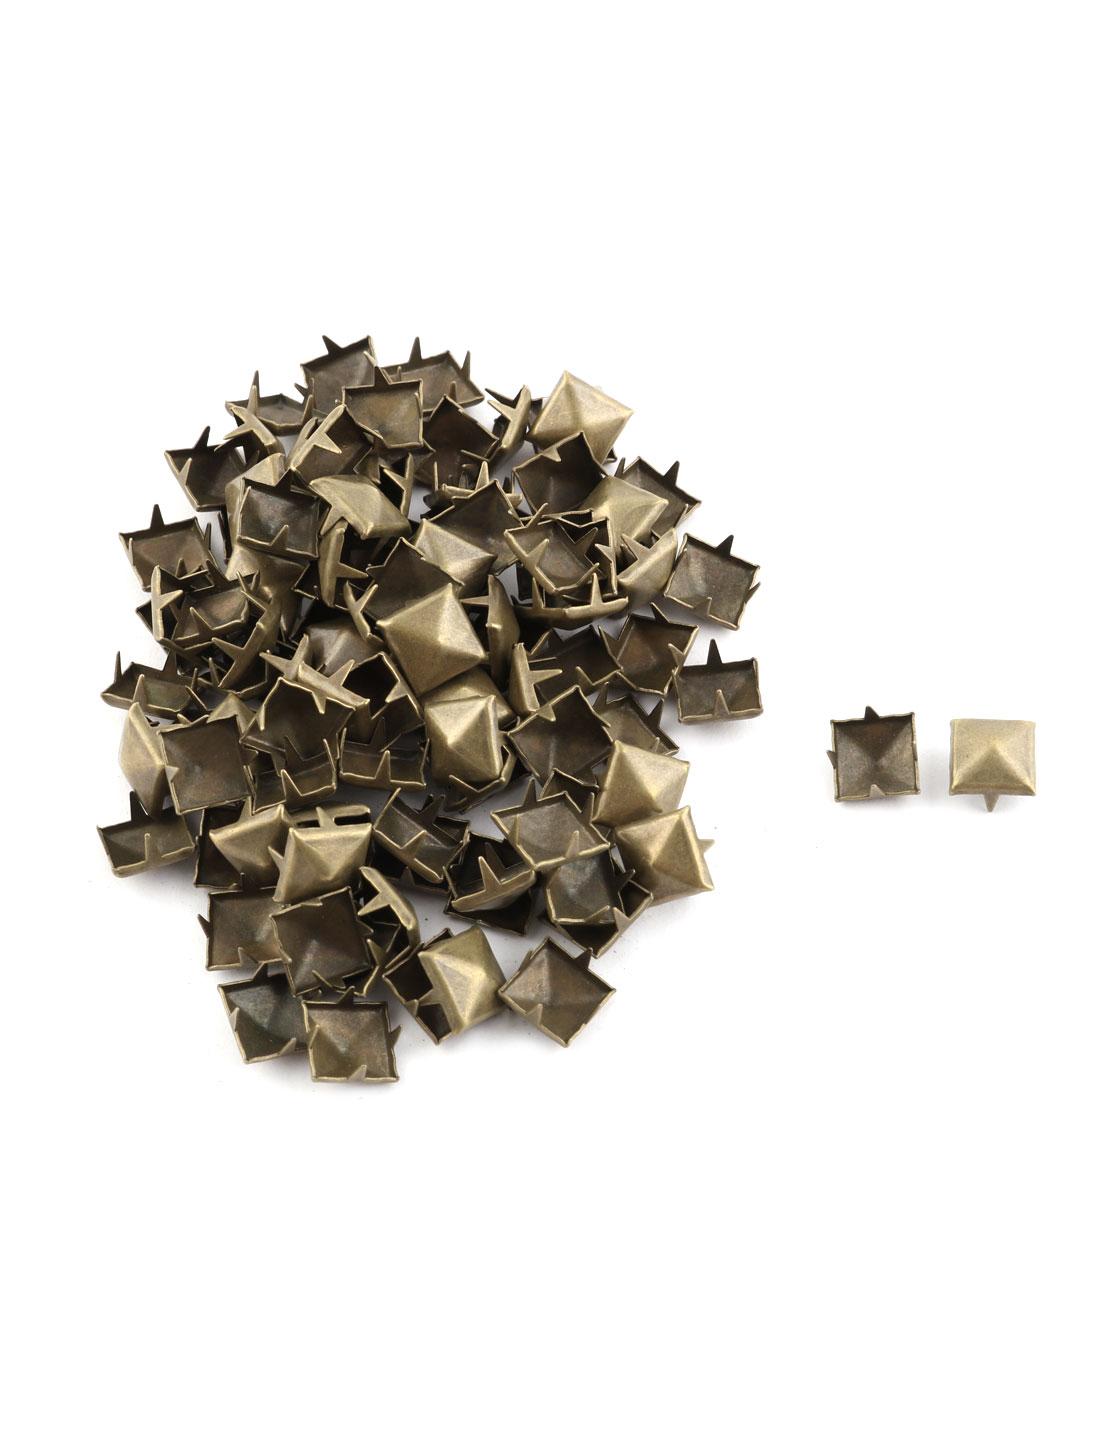 Metal Square Pyramid Shape DIY Rivet Studs Bronze Tone 9mm 100pcs for Clothing Bag